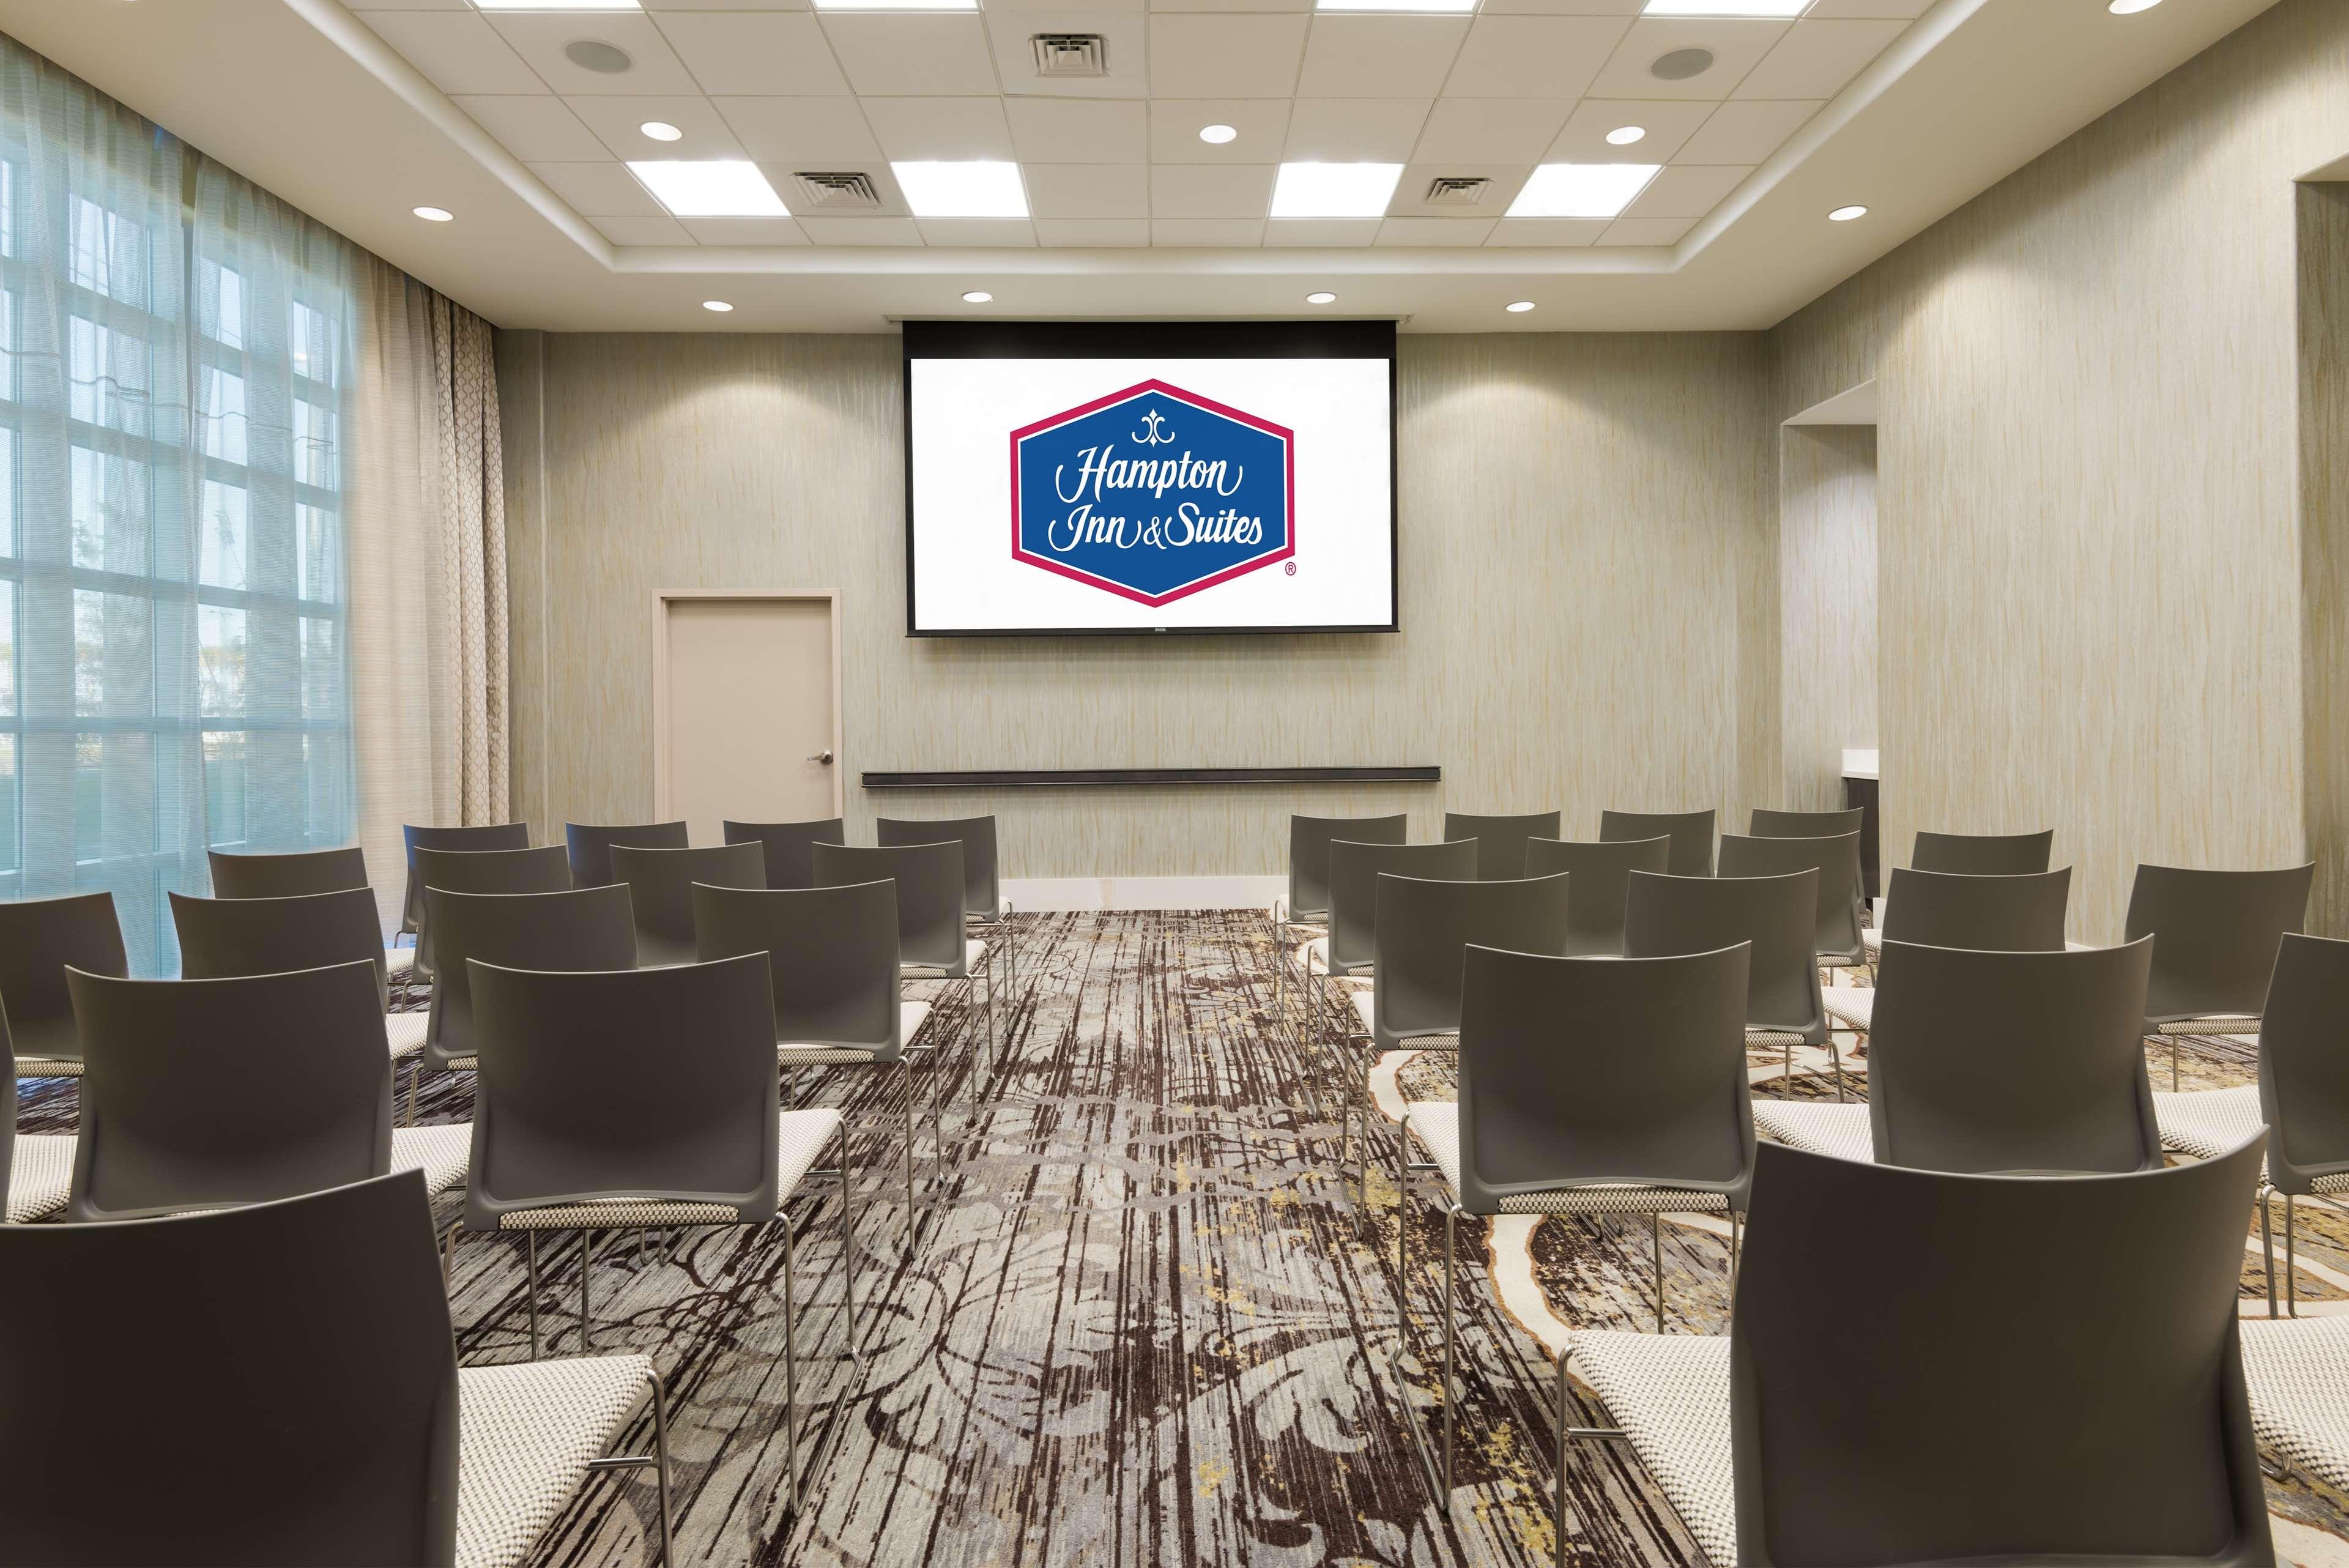 Hampton Inn & Suites Tampa Airport Avion Park Westshore image 27